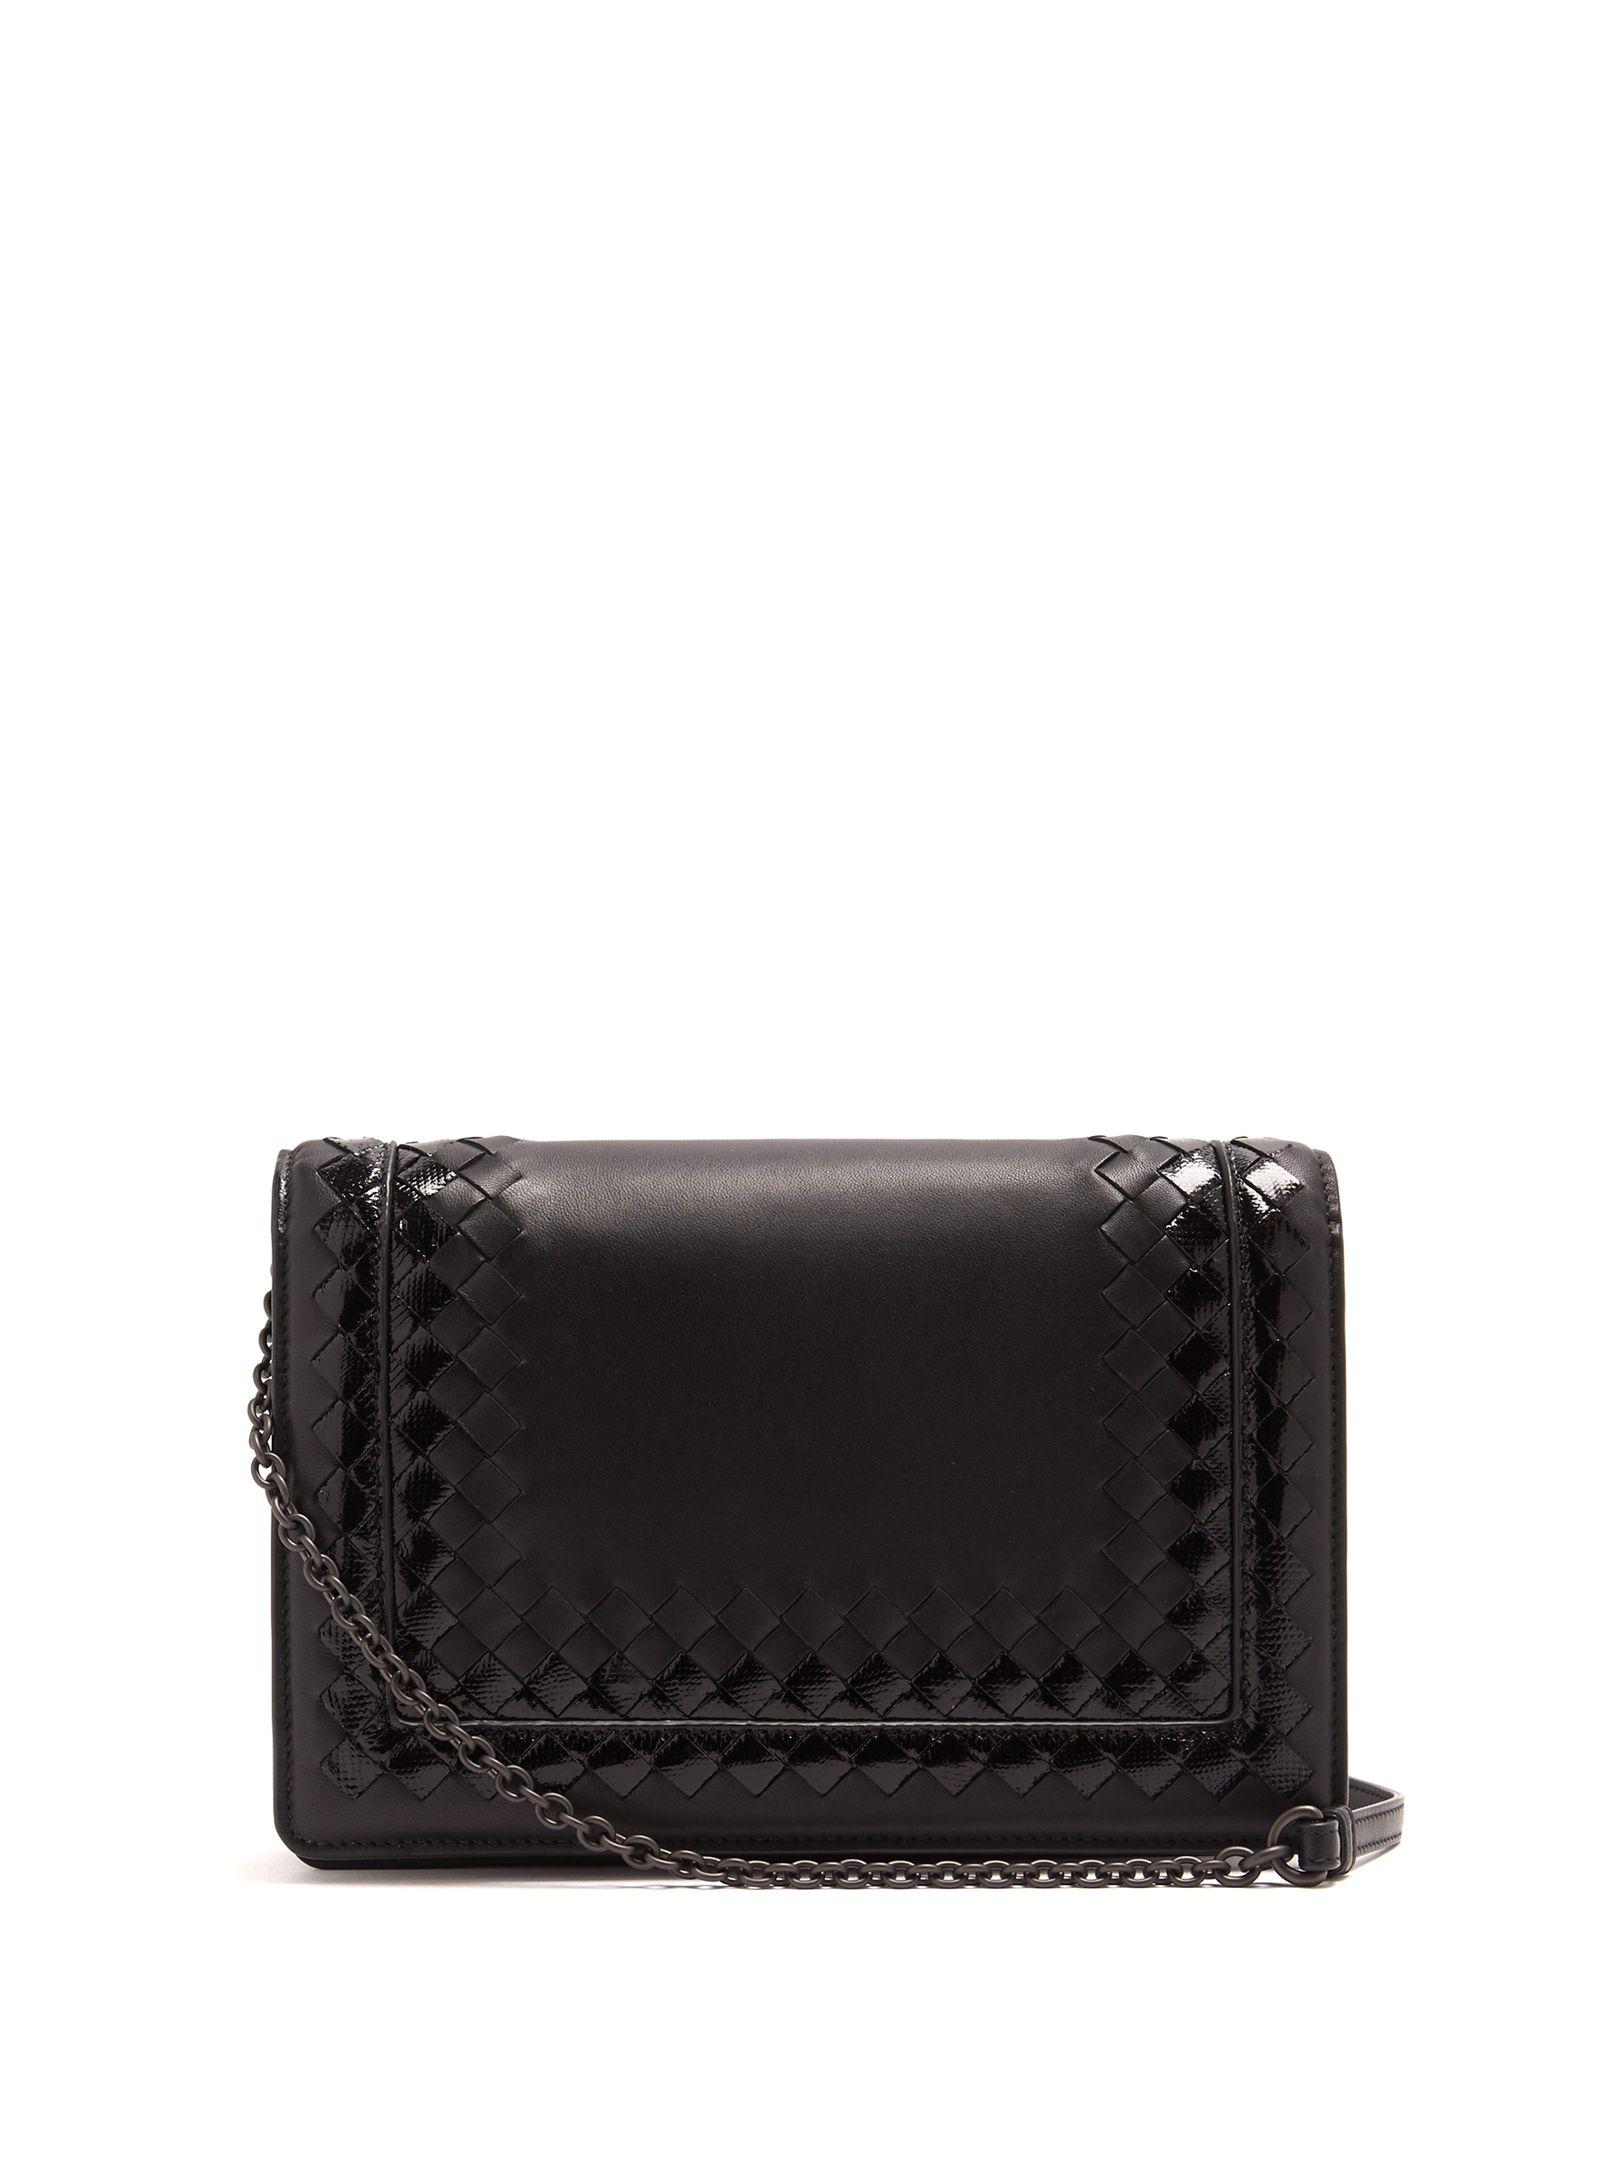 7ce062fd20 BOTTEGA VENETA Montebello leather shoulder bag.  bottegaveneta  bags   shoulder bags  leather